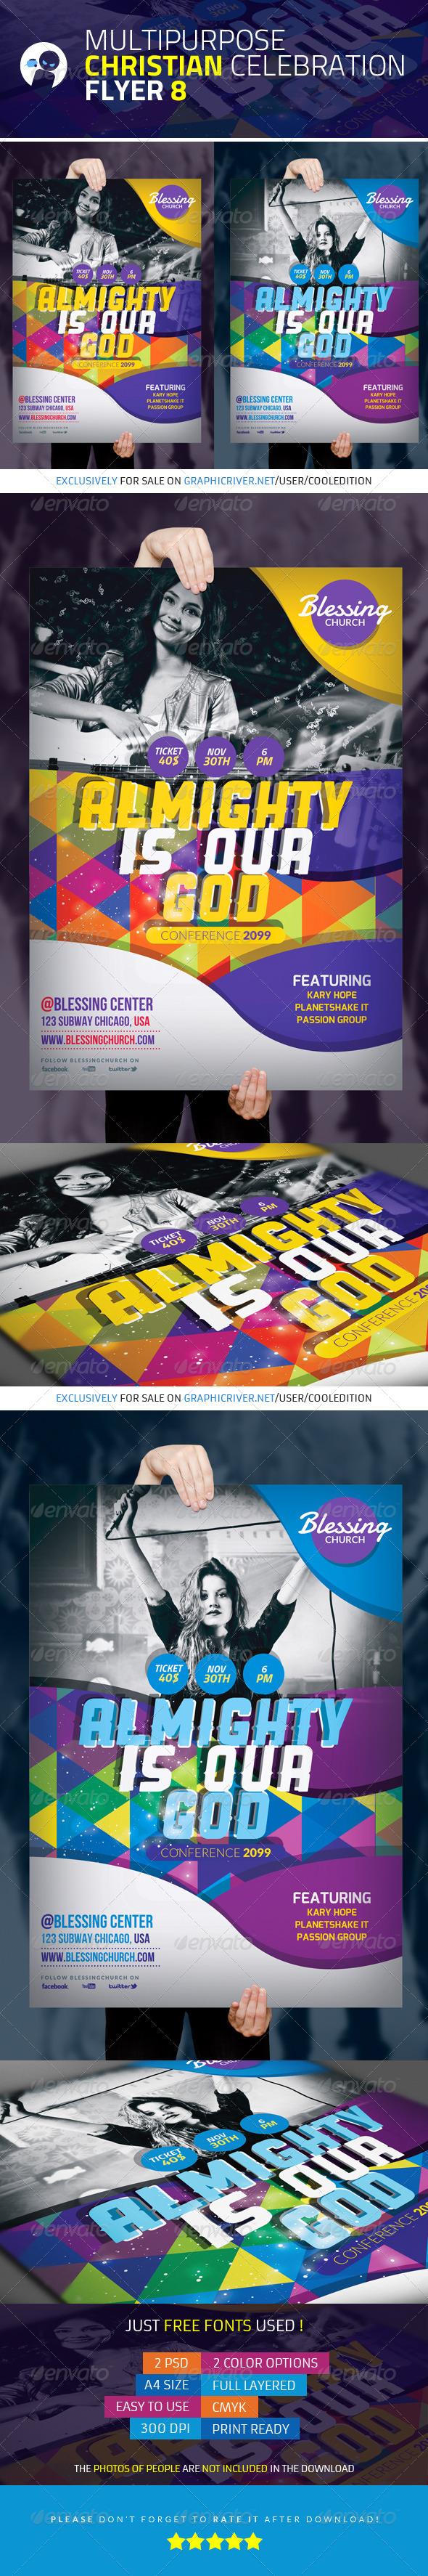 GraphicRiver Multipurpose Christian Celebration Flyer 8 4377266